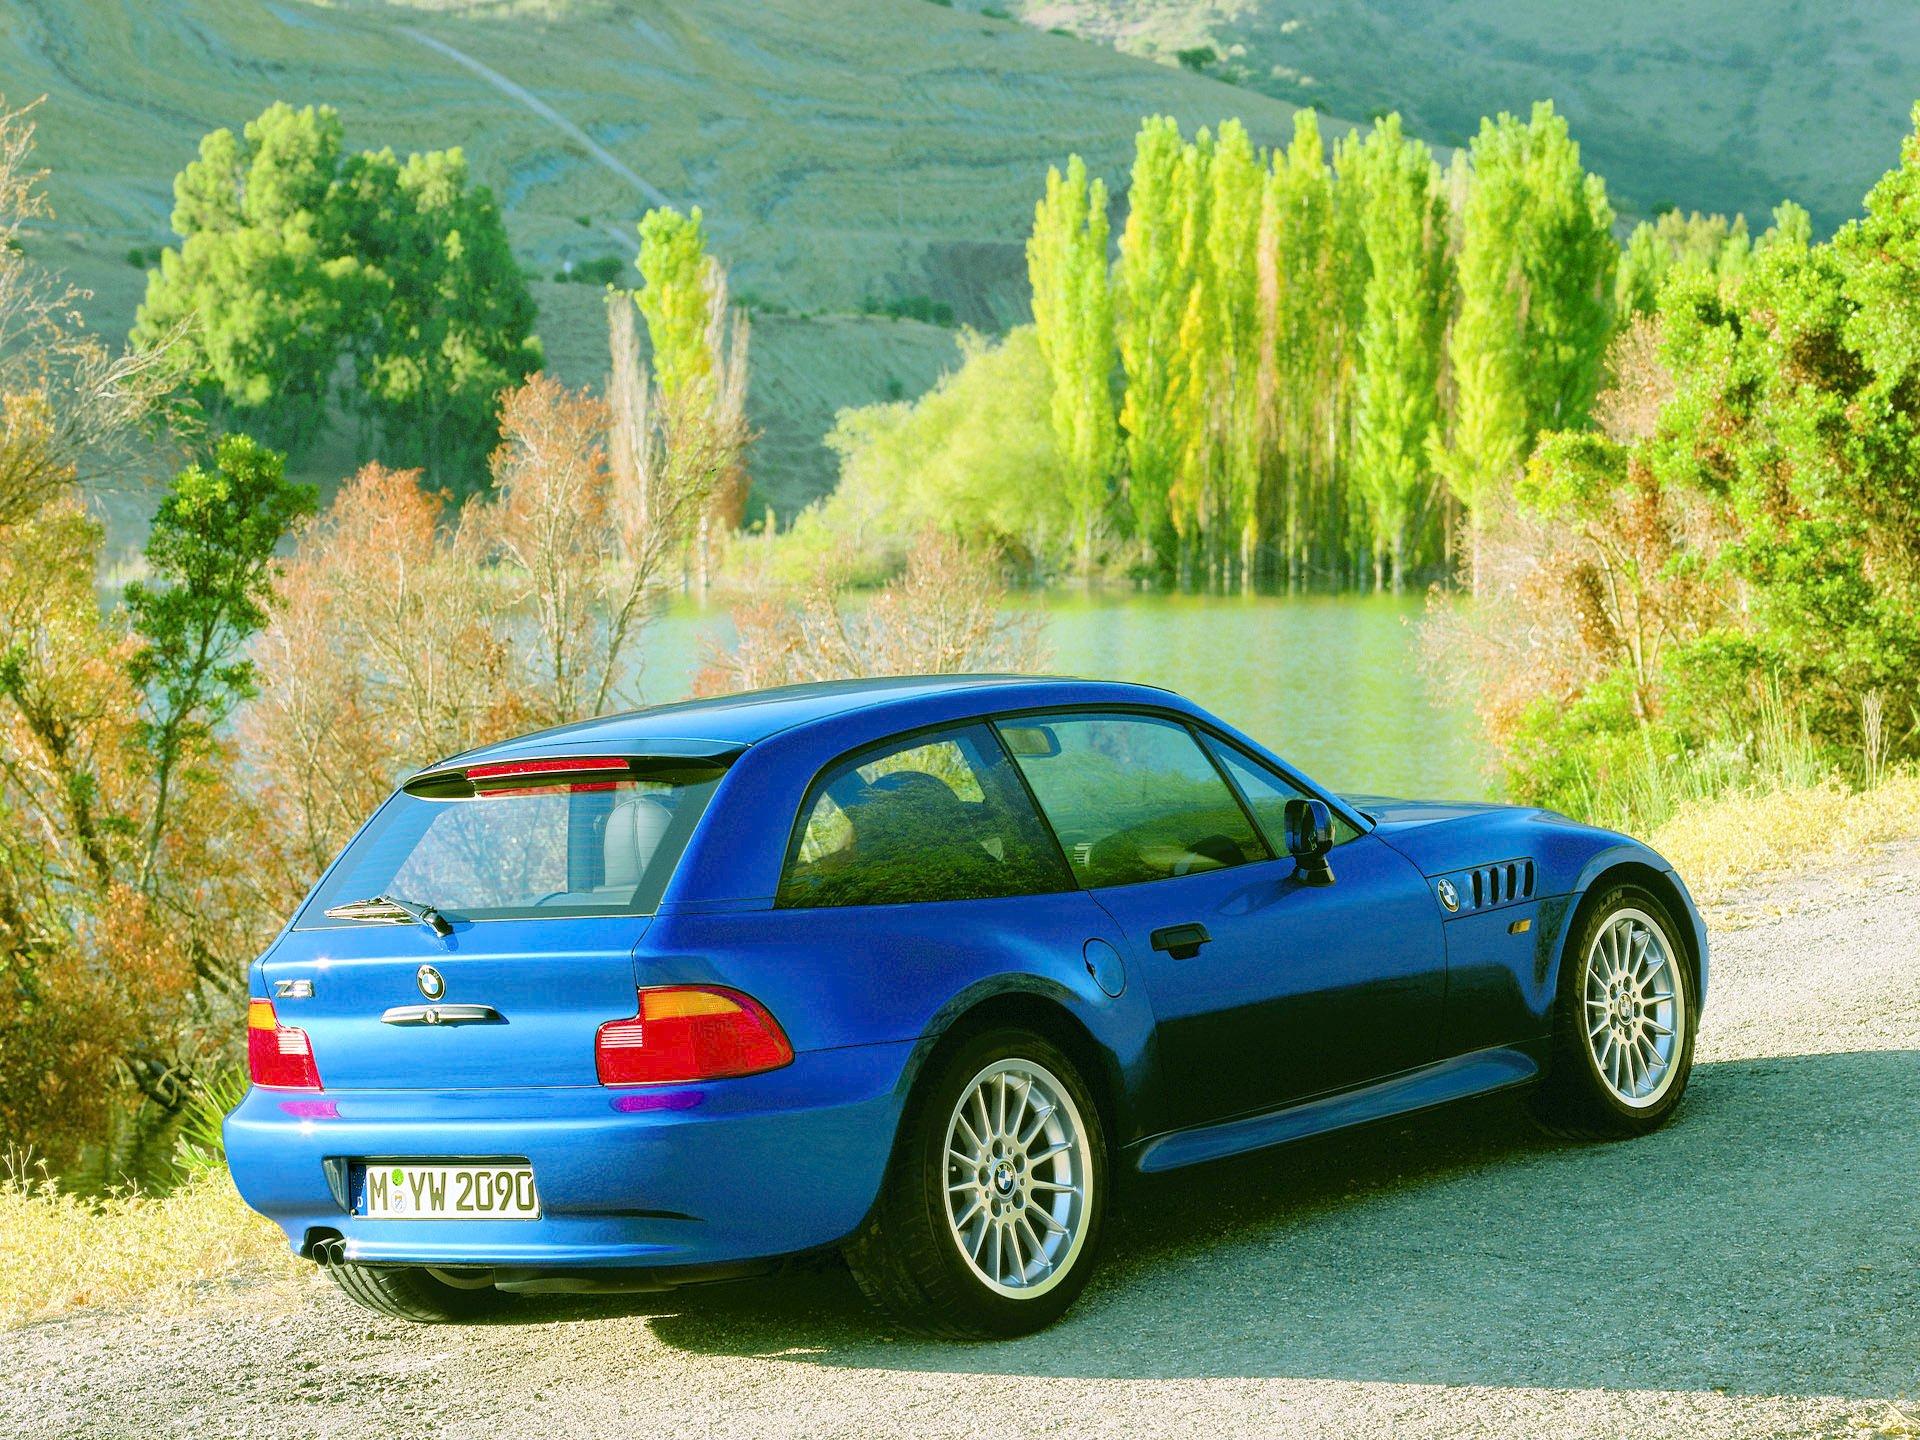 BMW Z3 HD Wallpaper | Background Image | 1920x1440 | ID ...